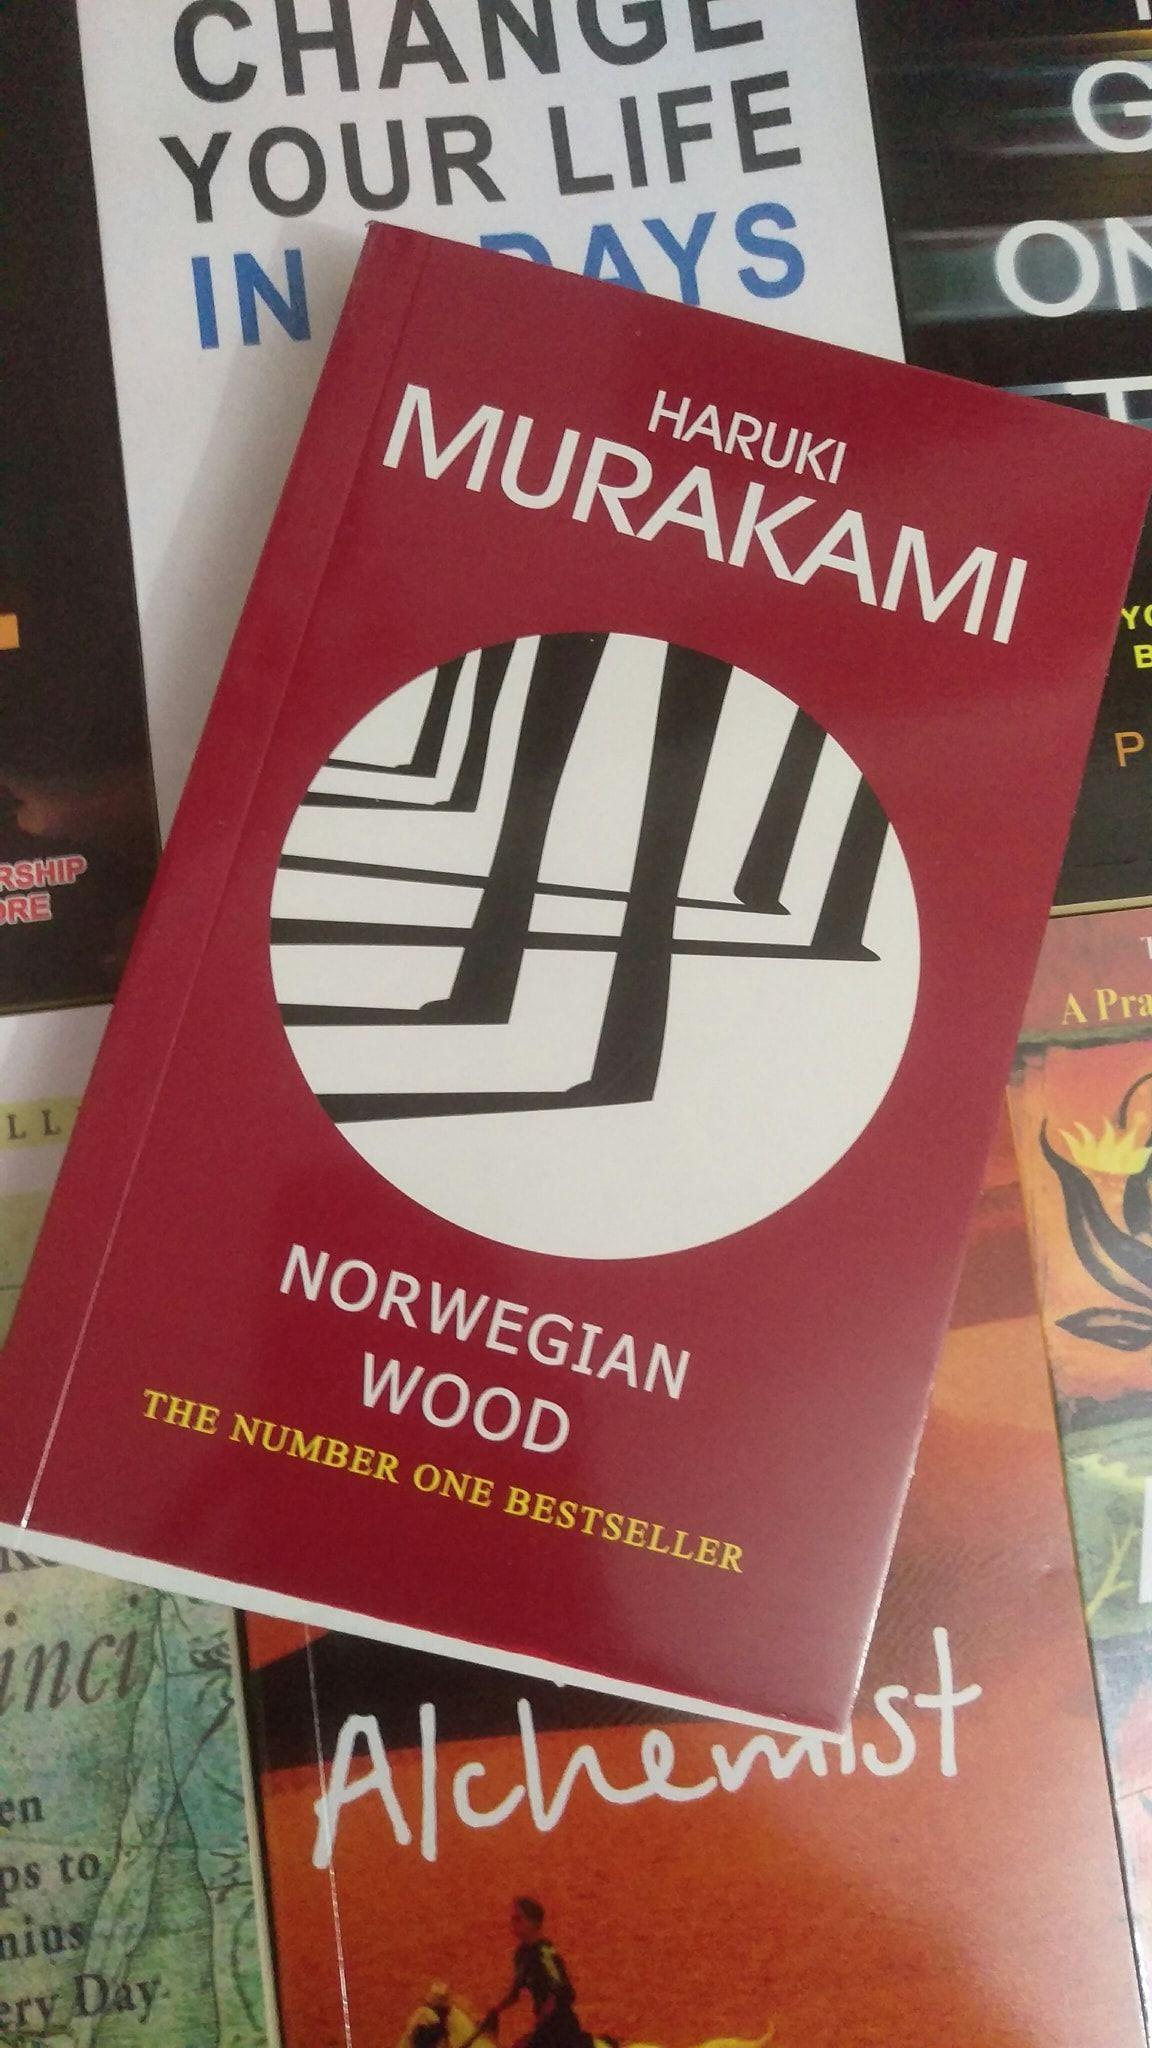 Norwegian Wood by Haruki Mukarami